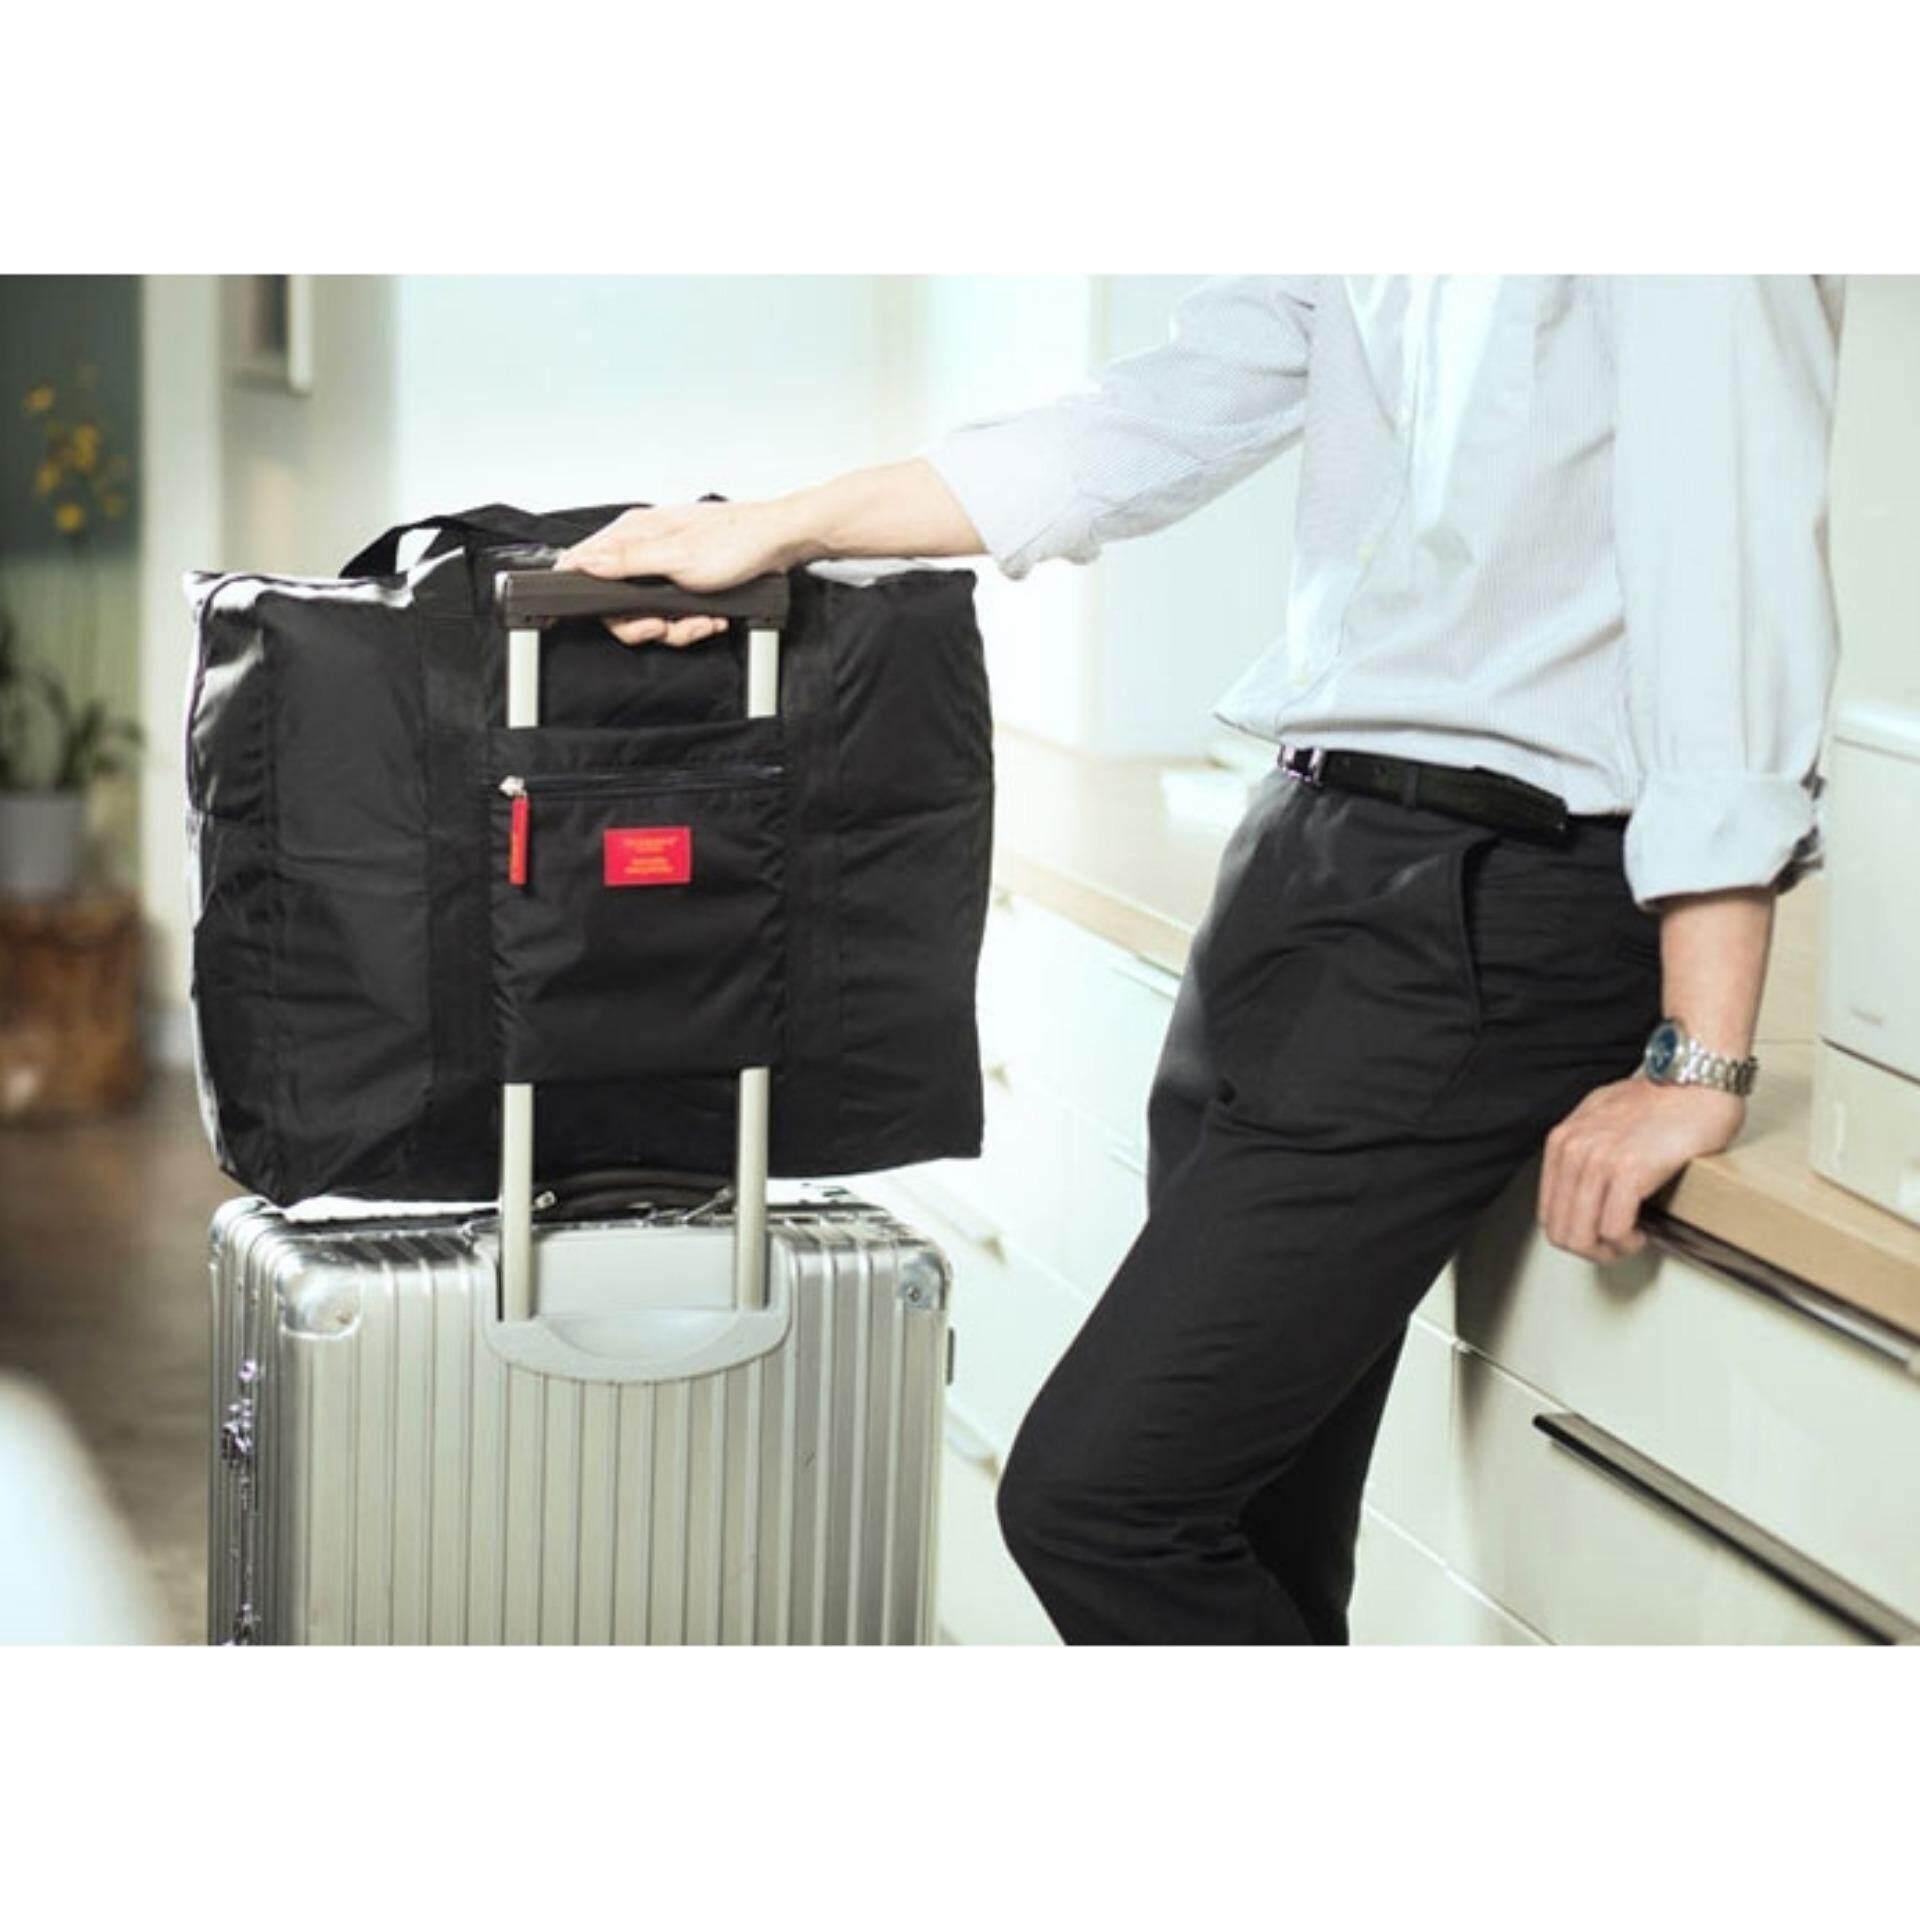 Bolster Store Large Capacity Nylon Fordable Travel Waterproof Bag Storage Light Weight Bag (Black)